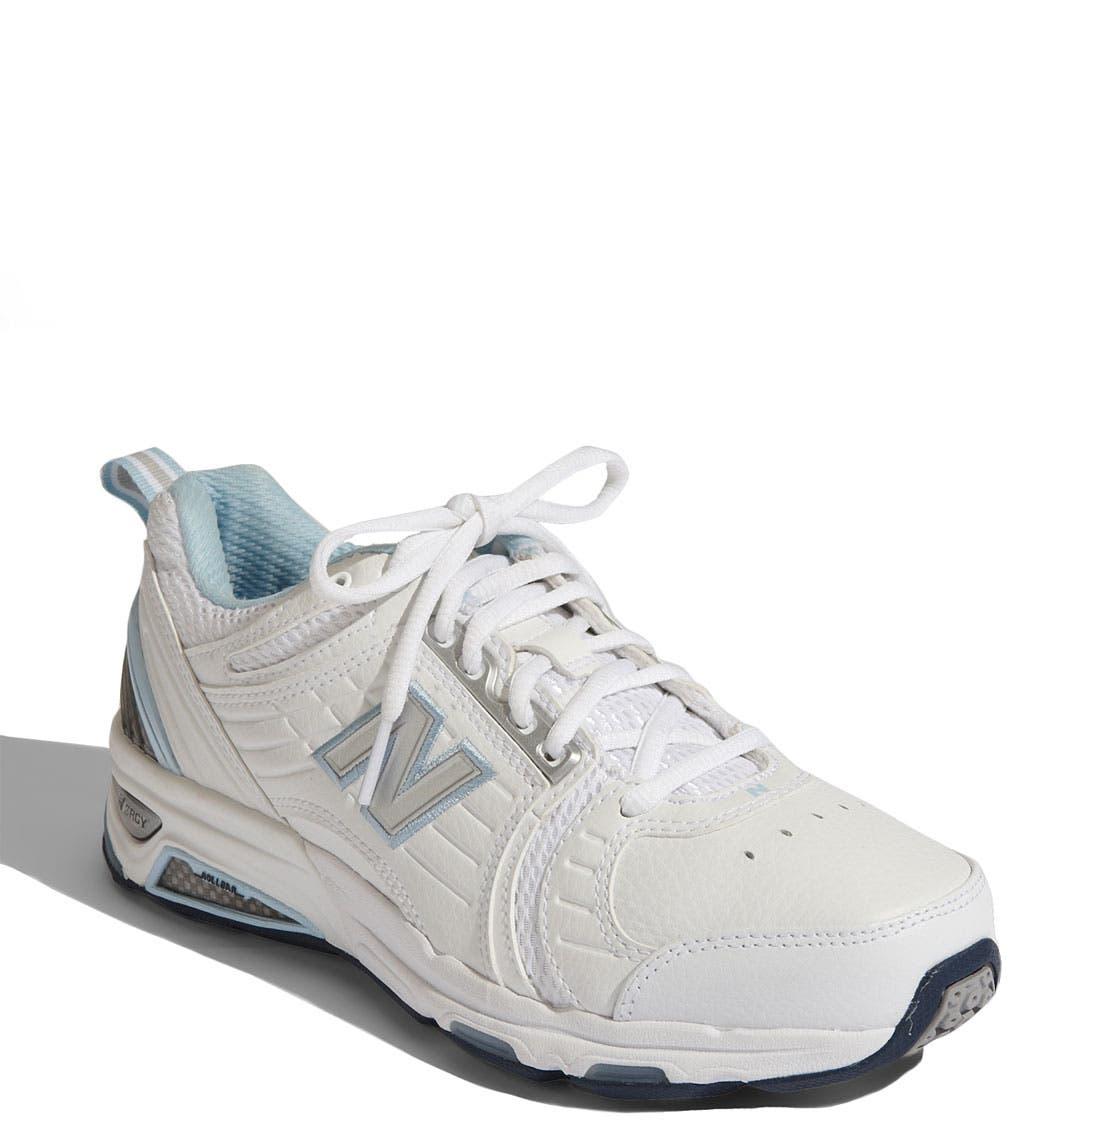 NEW BALANCE,                             '856' Training Shoe,                             Main thumbnail 1, color,                             110